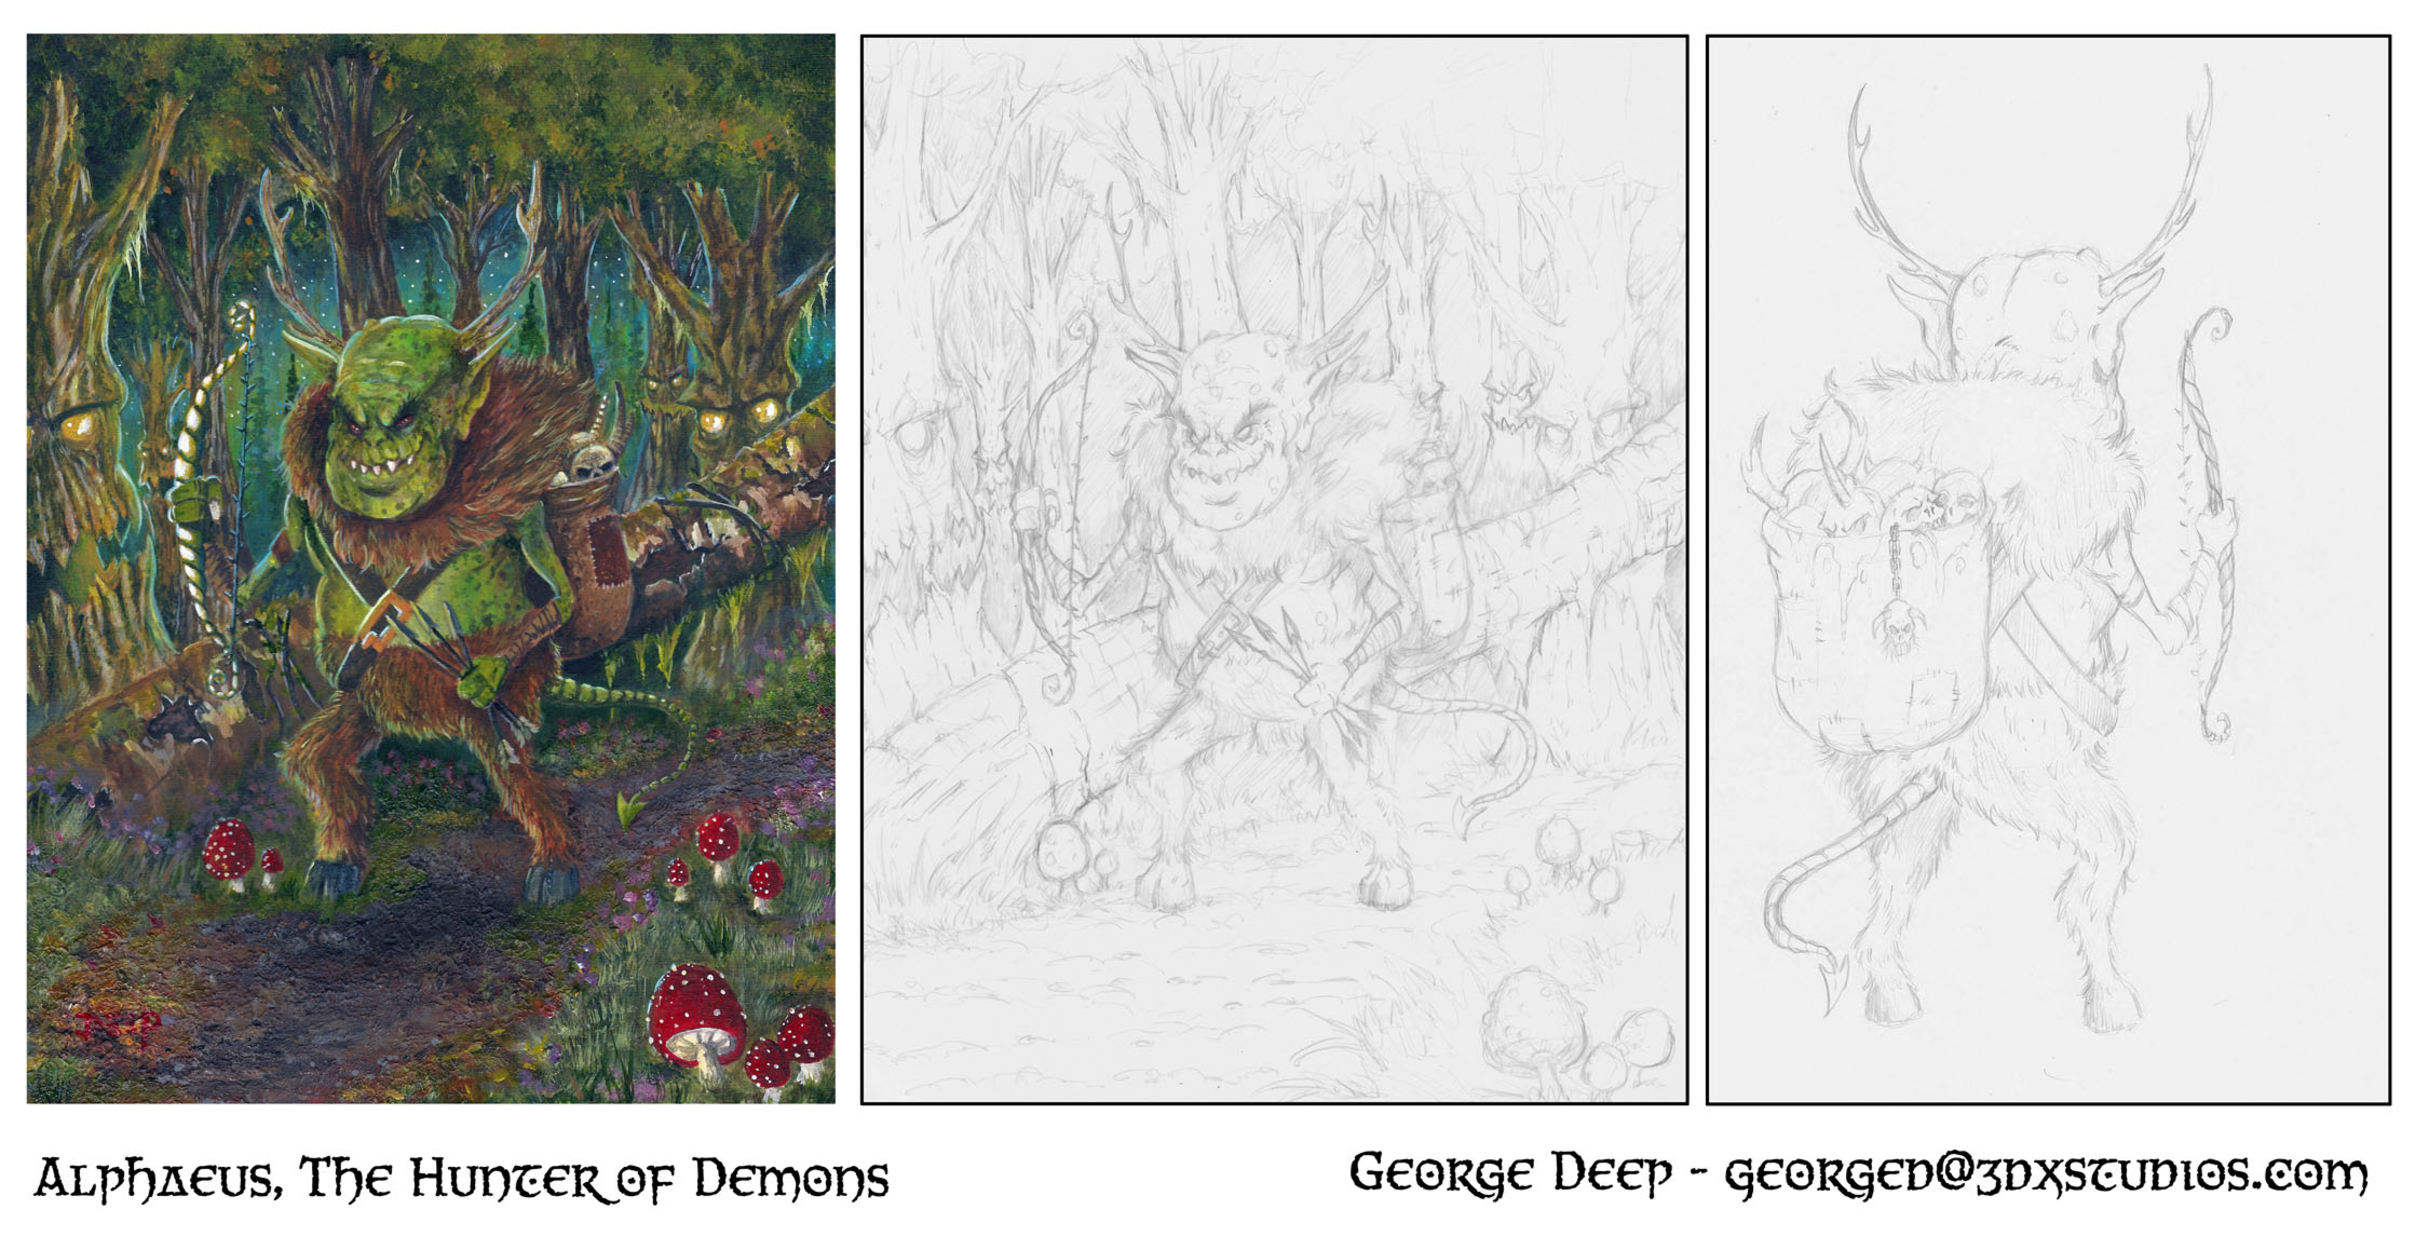 Alphaeus, The Hunter of Demons Artwork by George Deep